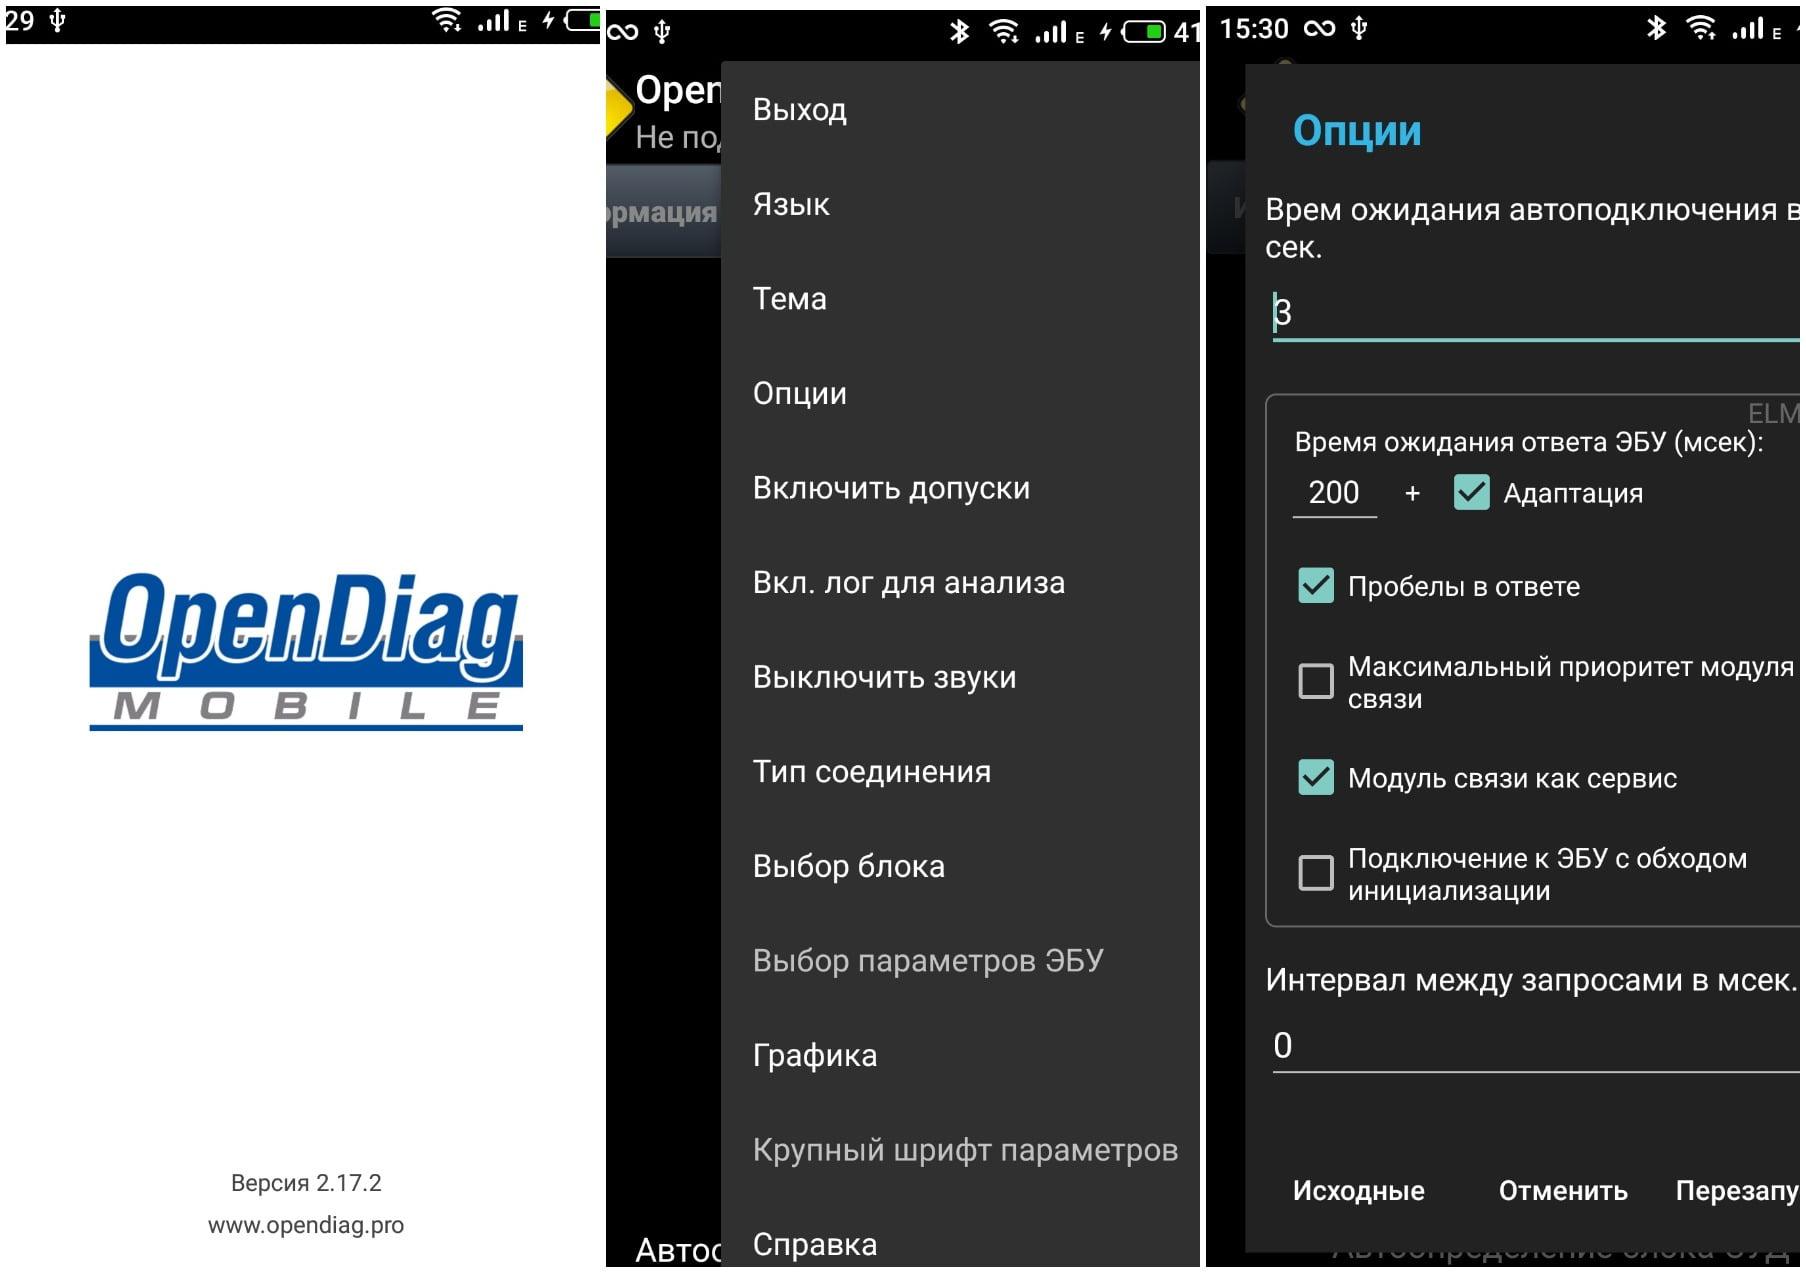 На фото приложение Opendiagmobile